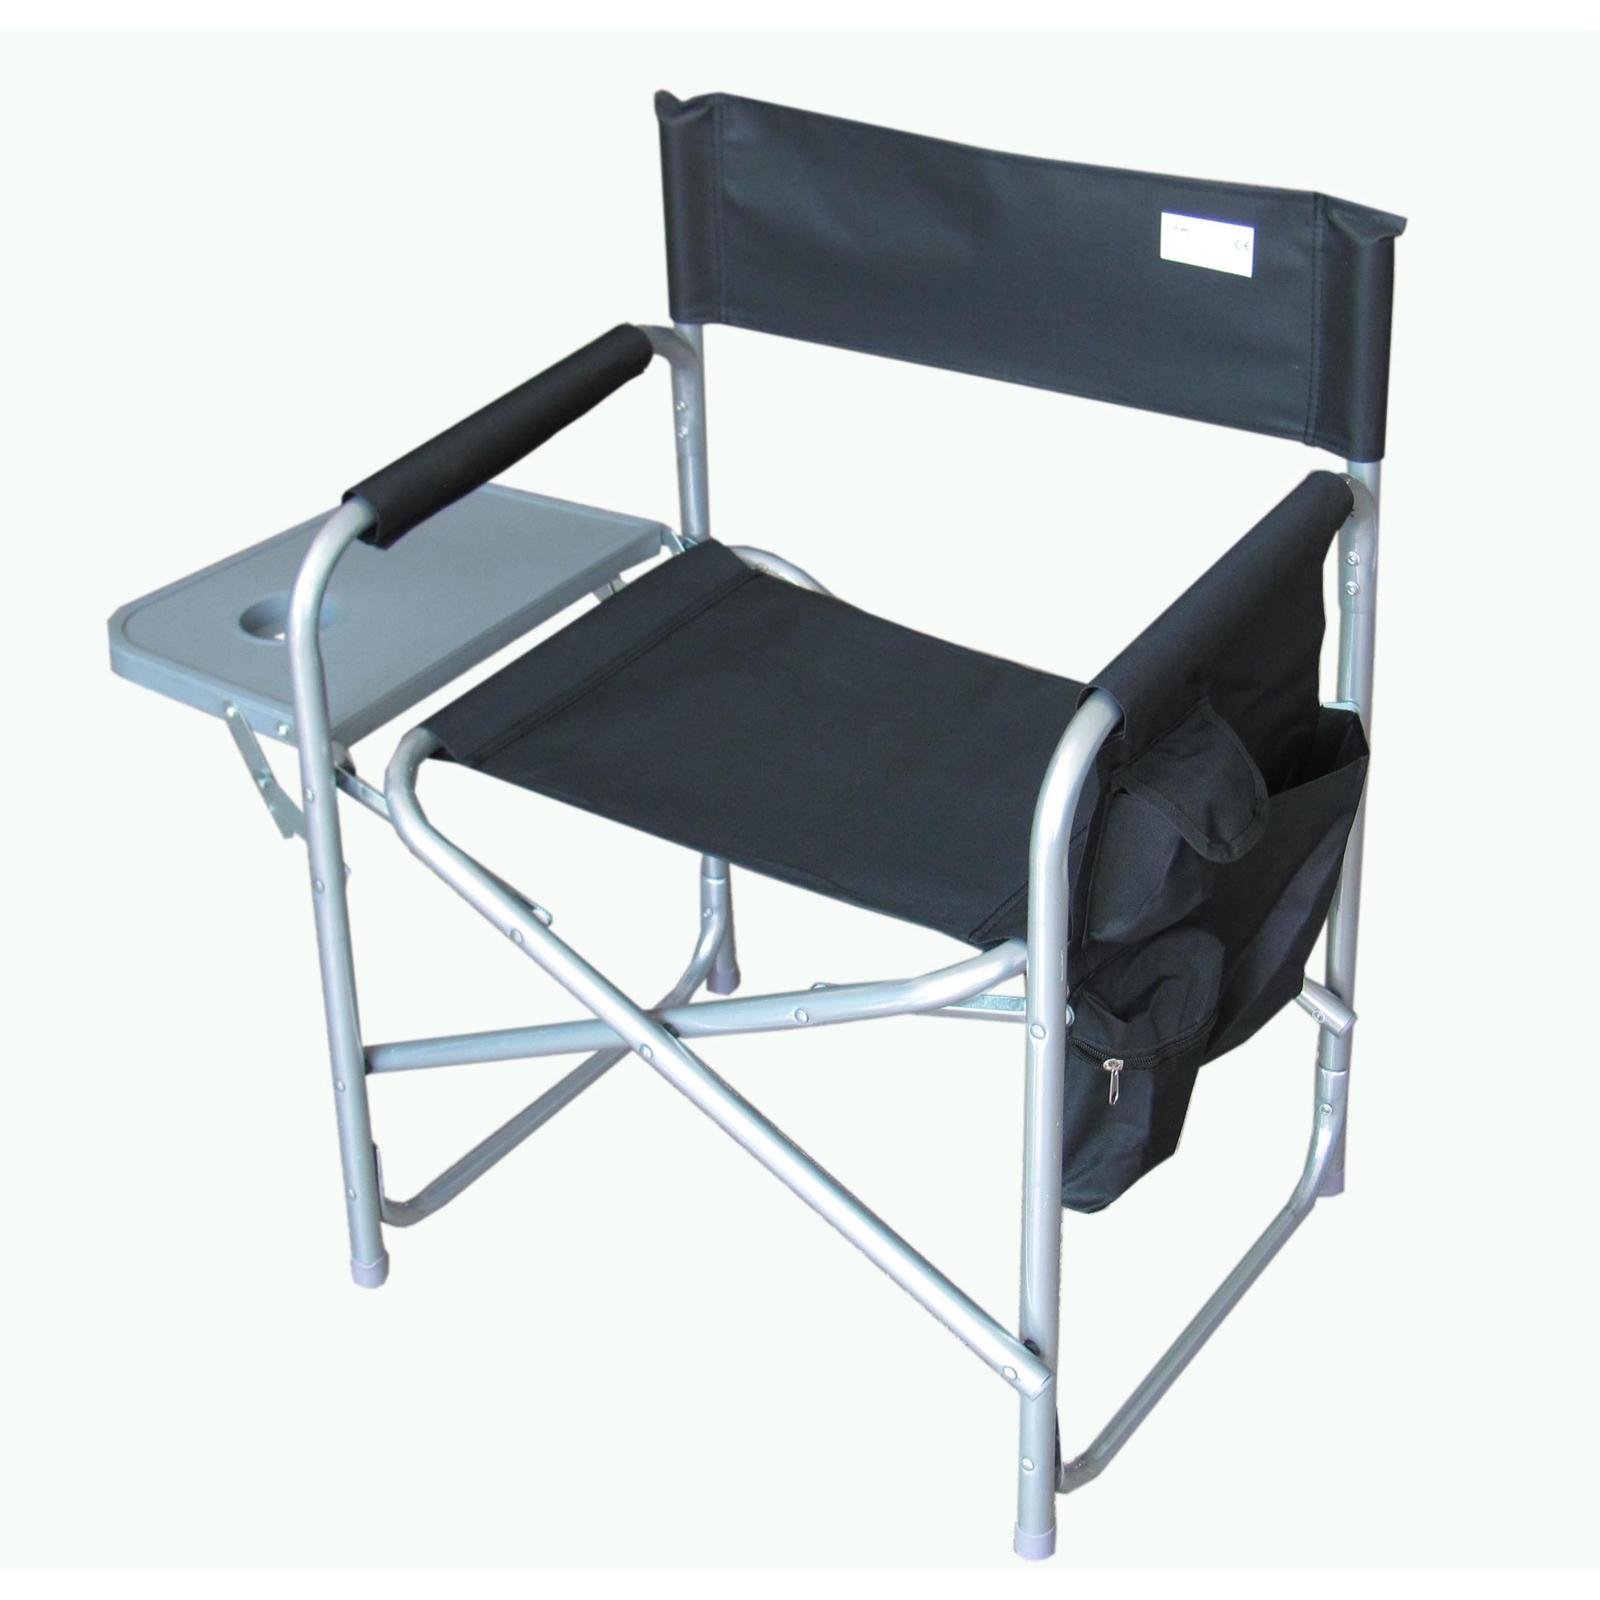 Portable Folding Fishing Chair Camping Outdoor Garden Seat